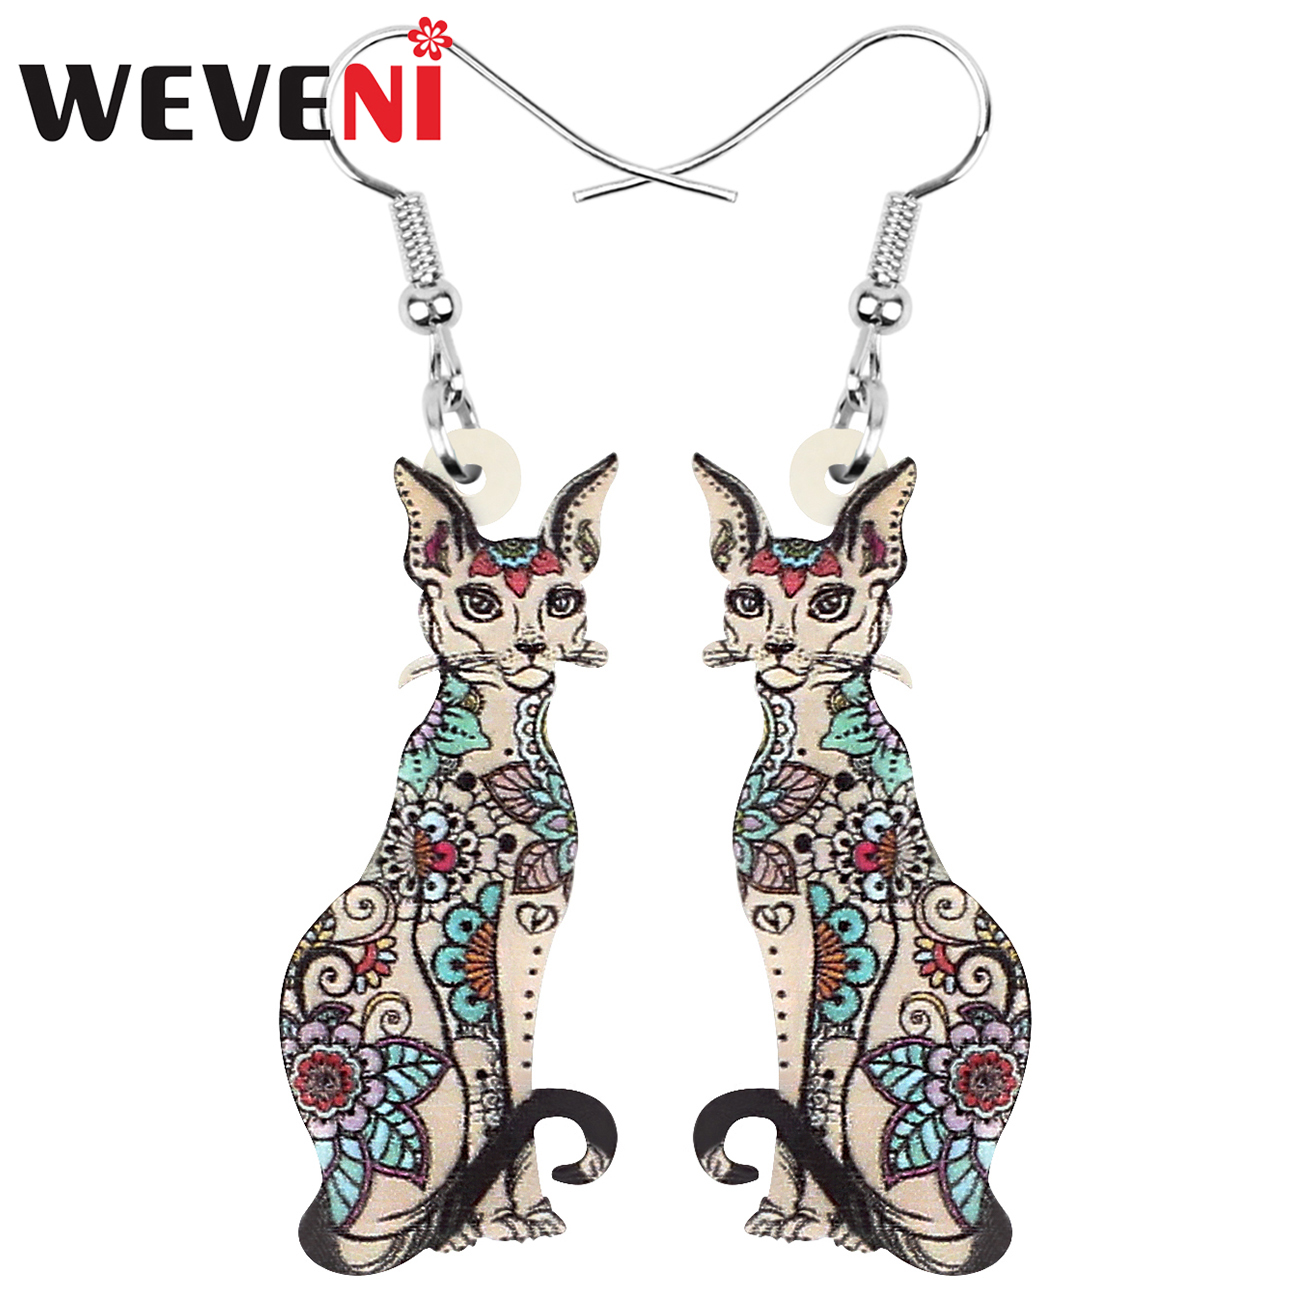 WEVENI Acrylic Canadian Hairless Cat Earrings Floral Cute Kitten Animal Dangle Drop Jewelry For Women Girl Trendy Gift Accessory